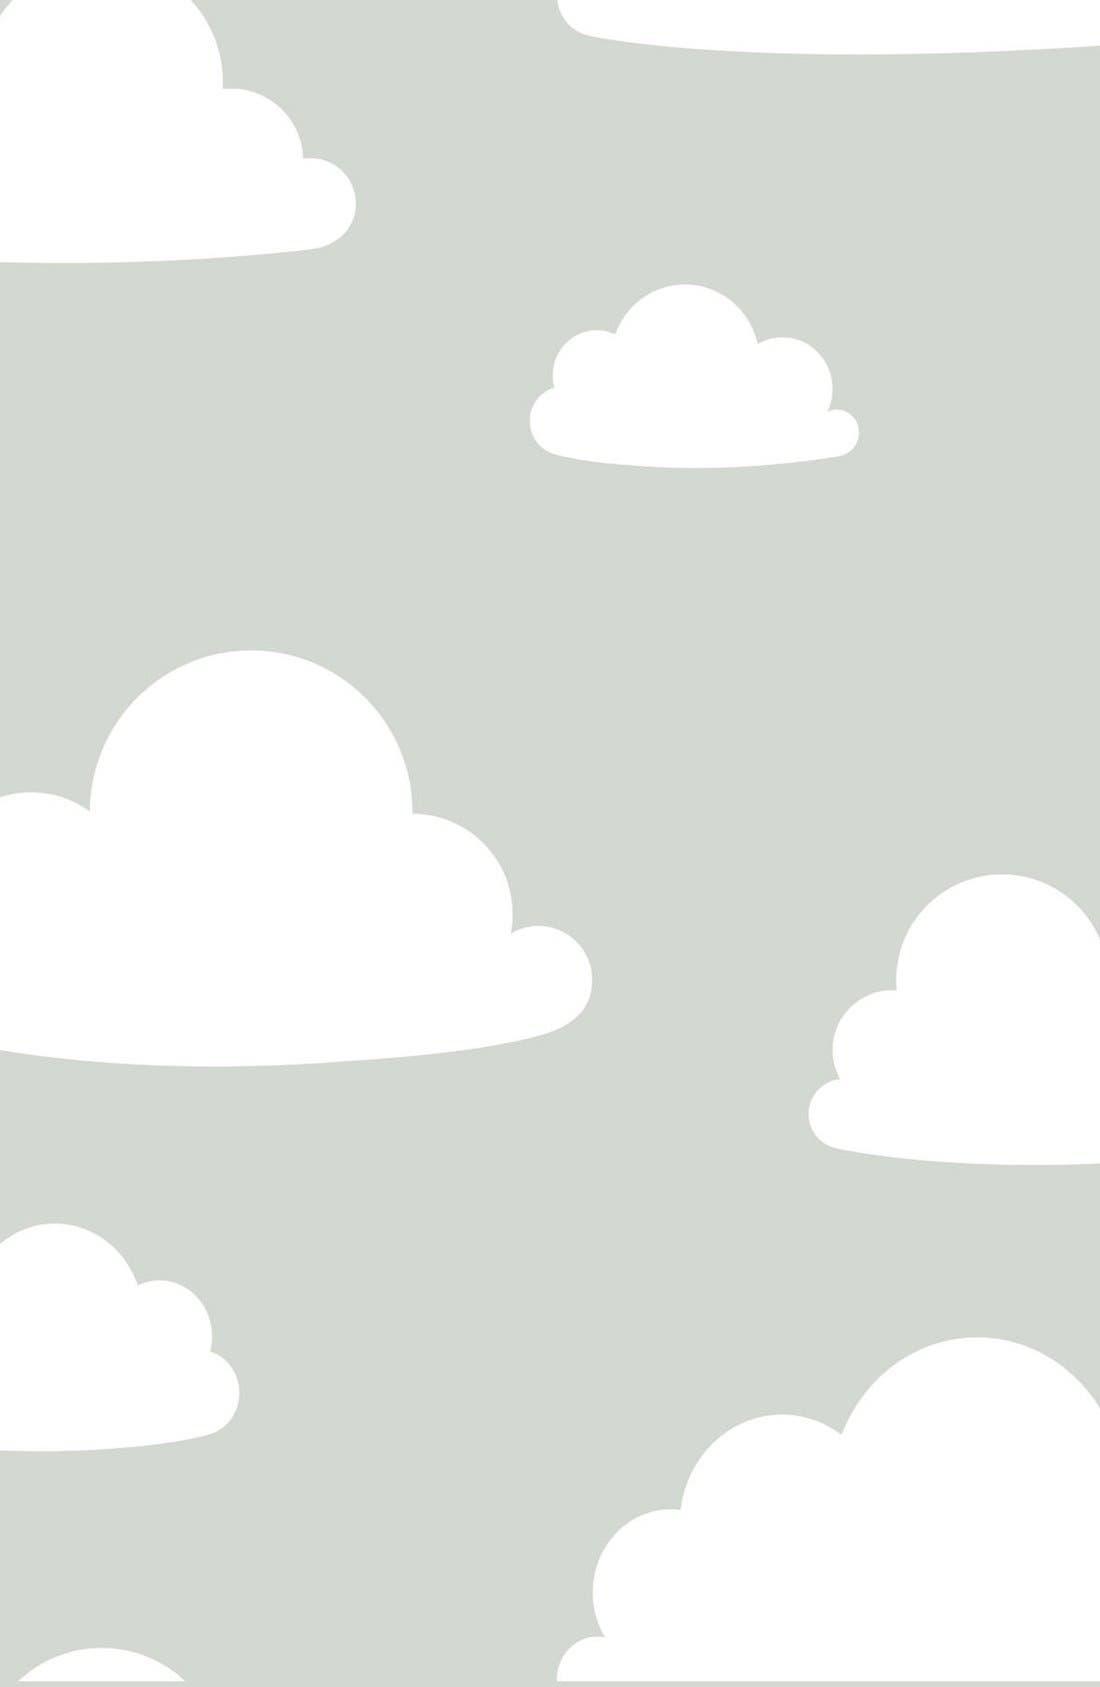 Alternate Image 1 Selected - Wallpops 'Clouds' Reusable Peel & Stick Vinyl Wallpaper